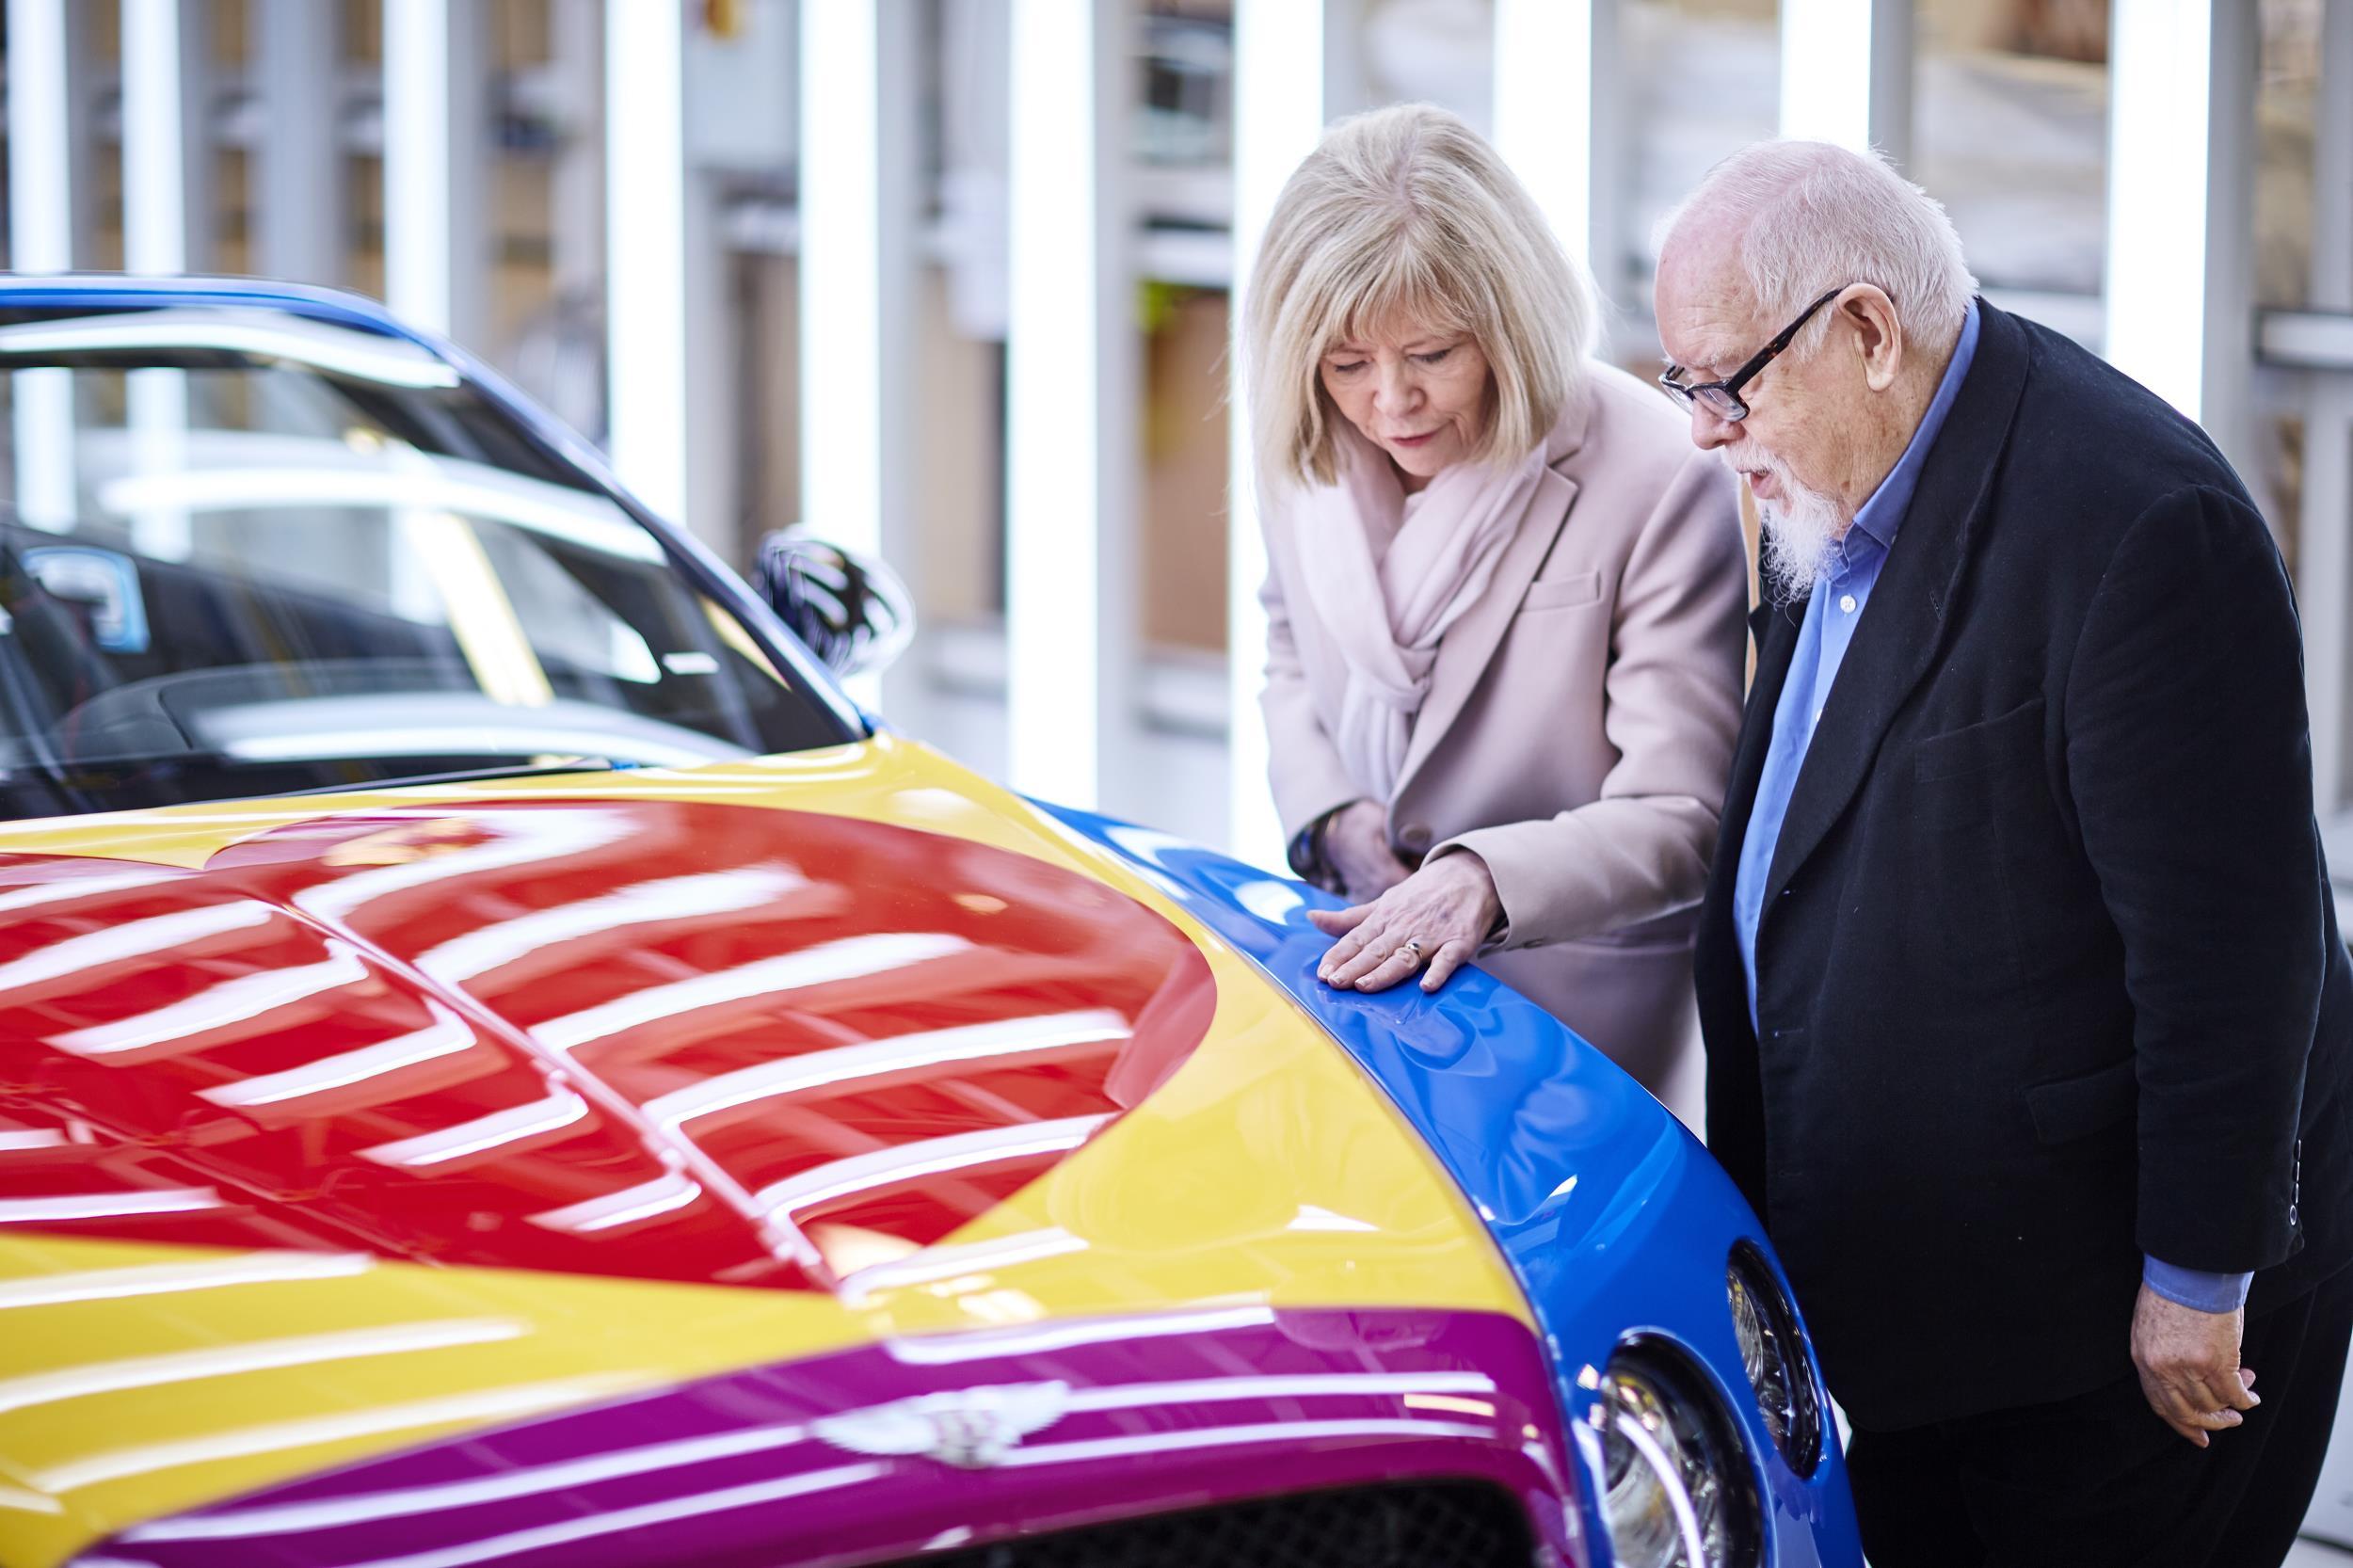 Discover the future of cars and transportation technology via @carsfera www.carsfera.com #cars #autoshow #conceptcars #conceptvehicles #bestcarstobuy #showroom #testdrive #safecar #safestcars #cars2017 #cars2018 #cars2016 #2017Mazda#Drivingmatters#MazdaRoaster#MazdaMX5#Worldbestcardesign#NYIAS2016#Lexus_V_LCRO_Technology_#McLaren570SPortimao#FormulaE#Robocar#GTSpeedBlackEditionCoupeBentley#chevroletagainstcancer#chevrolet#covert#limitededlitionblack#NissanGTR#Recordguinness#2016LincolnMkX#2016_Blancpain_Sprint_#McLaren_650S_GT3#Ford's_LiDAR#virtualdriver#new_technology#Ford_Fussion_#Autonomous#Quintessence_AM37#Aston_Martin#CU_ICAR_Toyota_uBox_Concept_#_highRes_bmw-m-laptimer-gopro#Bentley_by_Blake